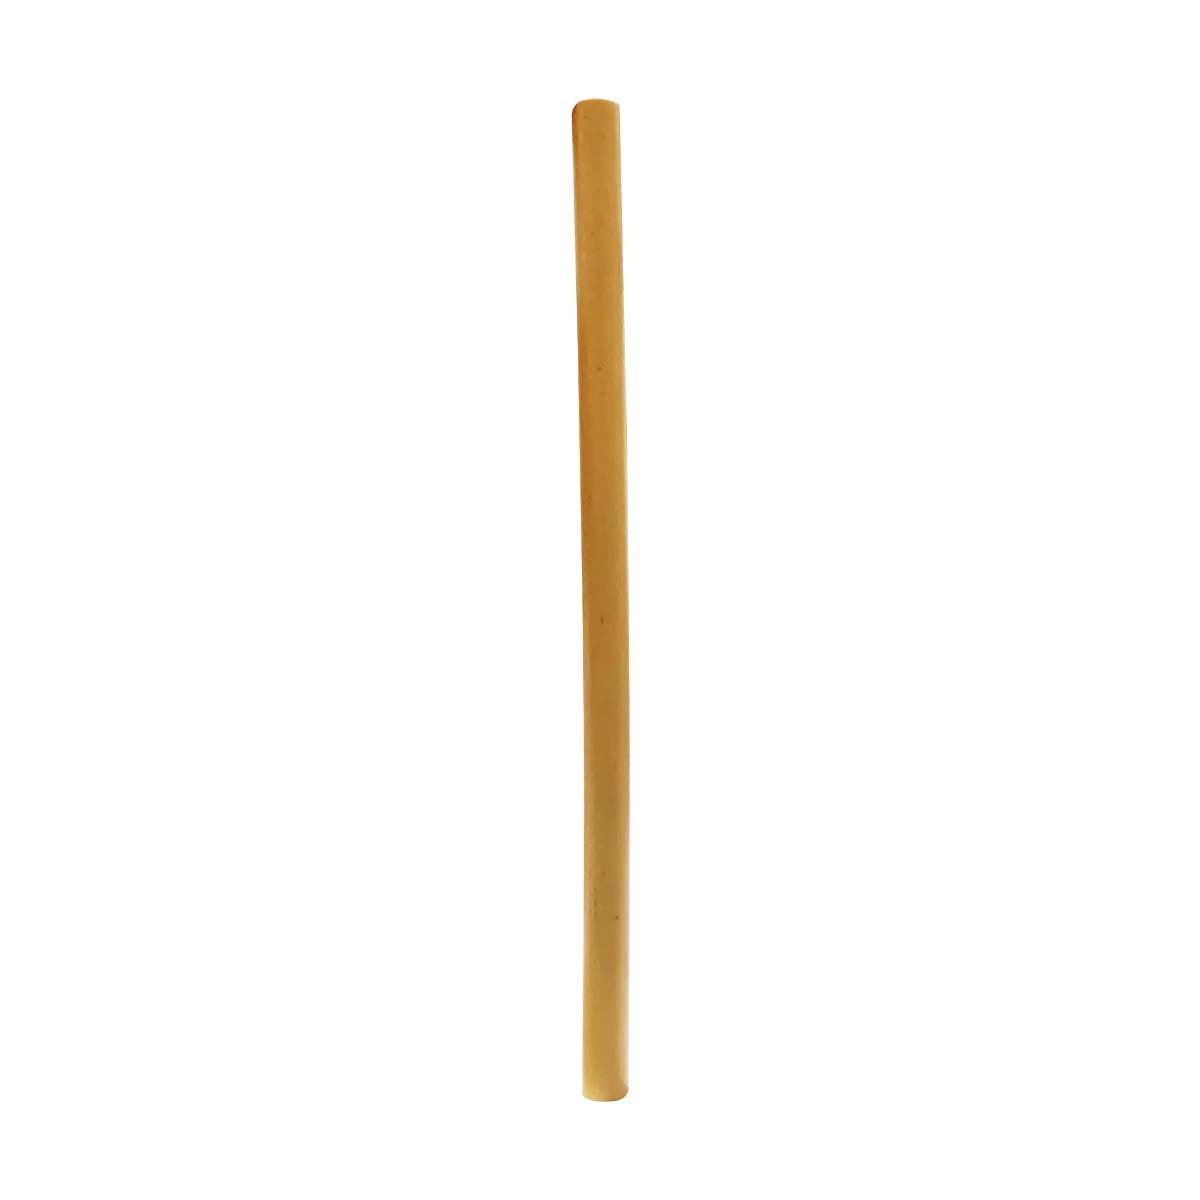 Kit Misto 5 em 1 - Bambu - Inox Dourado - Vidro + Escova + Bag